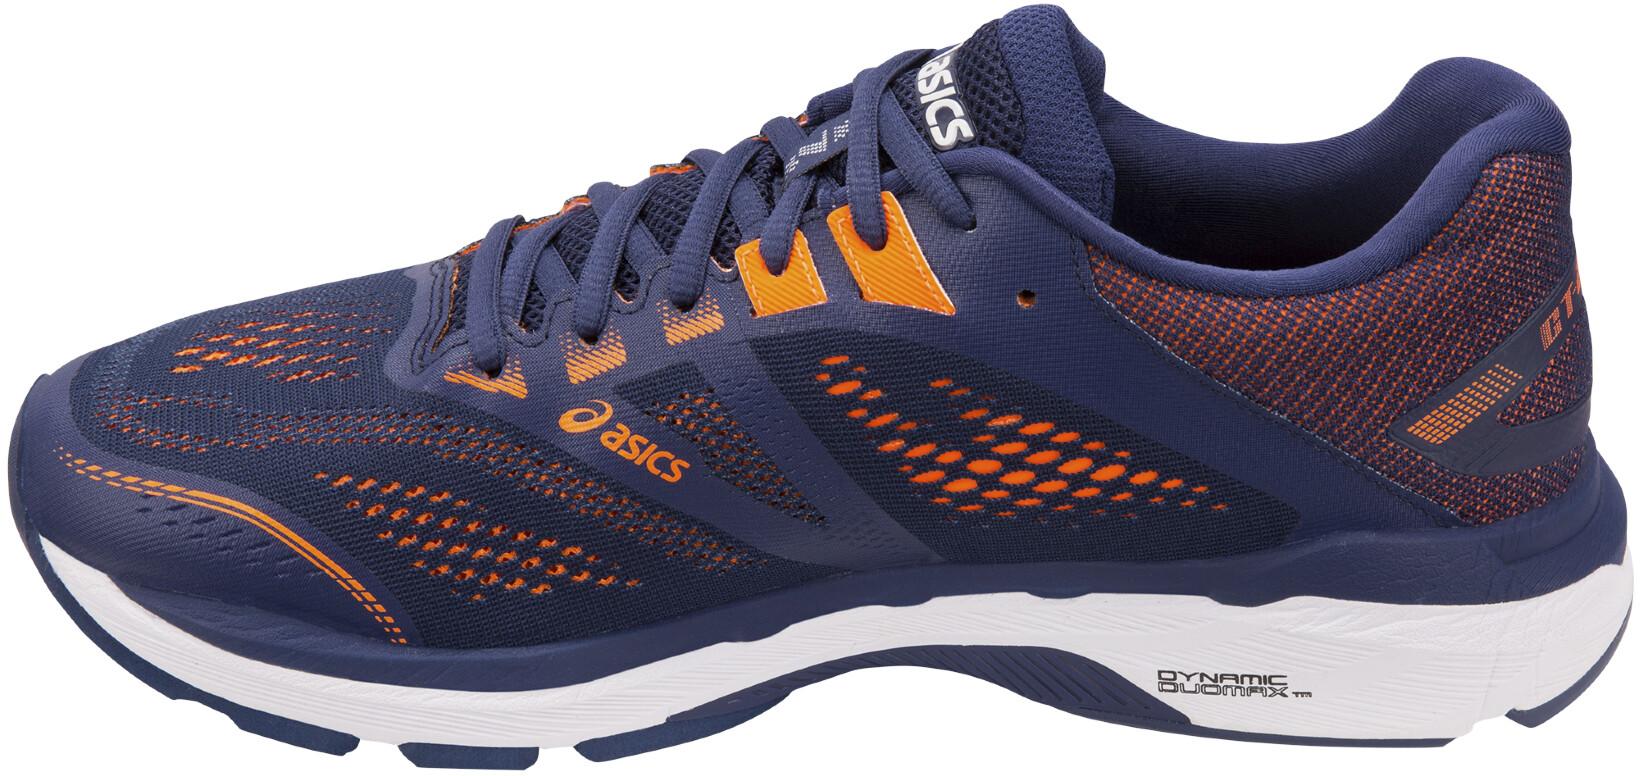 asics GT 2000 7 scarpe da corsa Uomo, indigo blueshocking orange